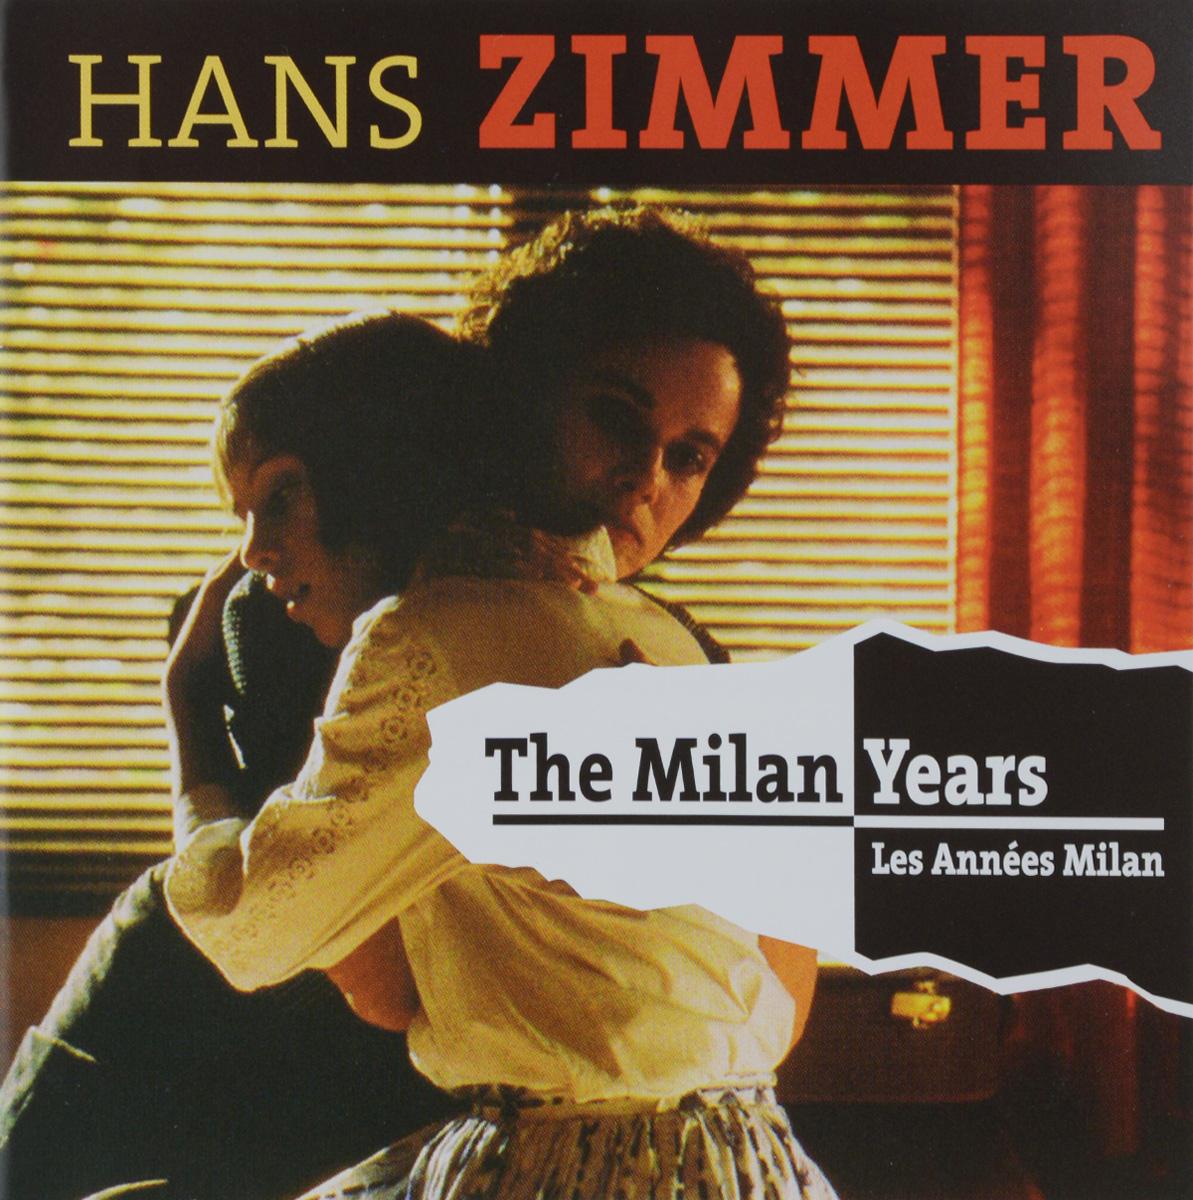 Ганс Циммер Hans Zimmer. The Milan Years (2 CD) hans zimmer hans zimmer the world of hans zimmer a symphonic celebration 3 lp 180 gr